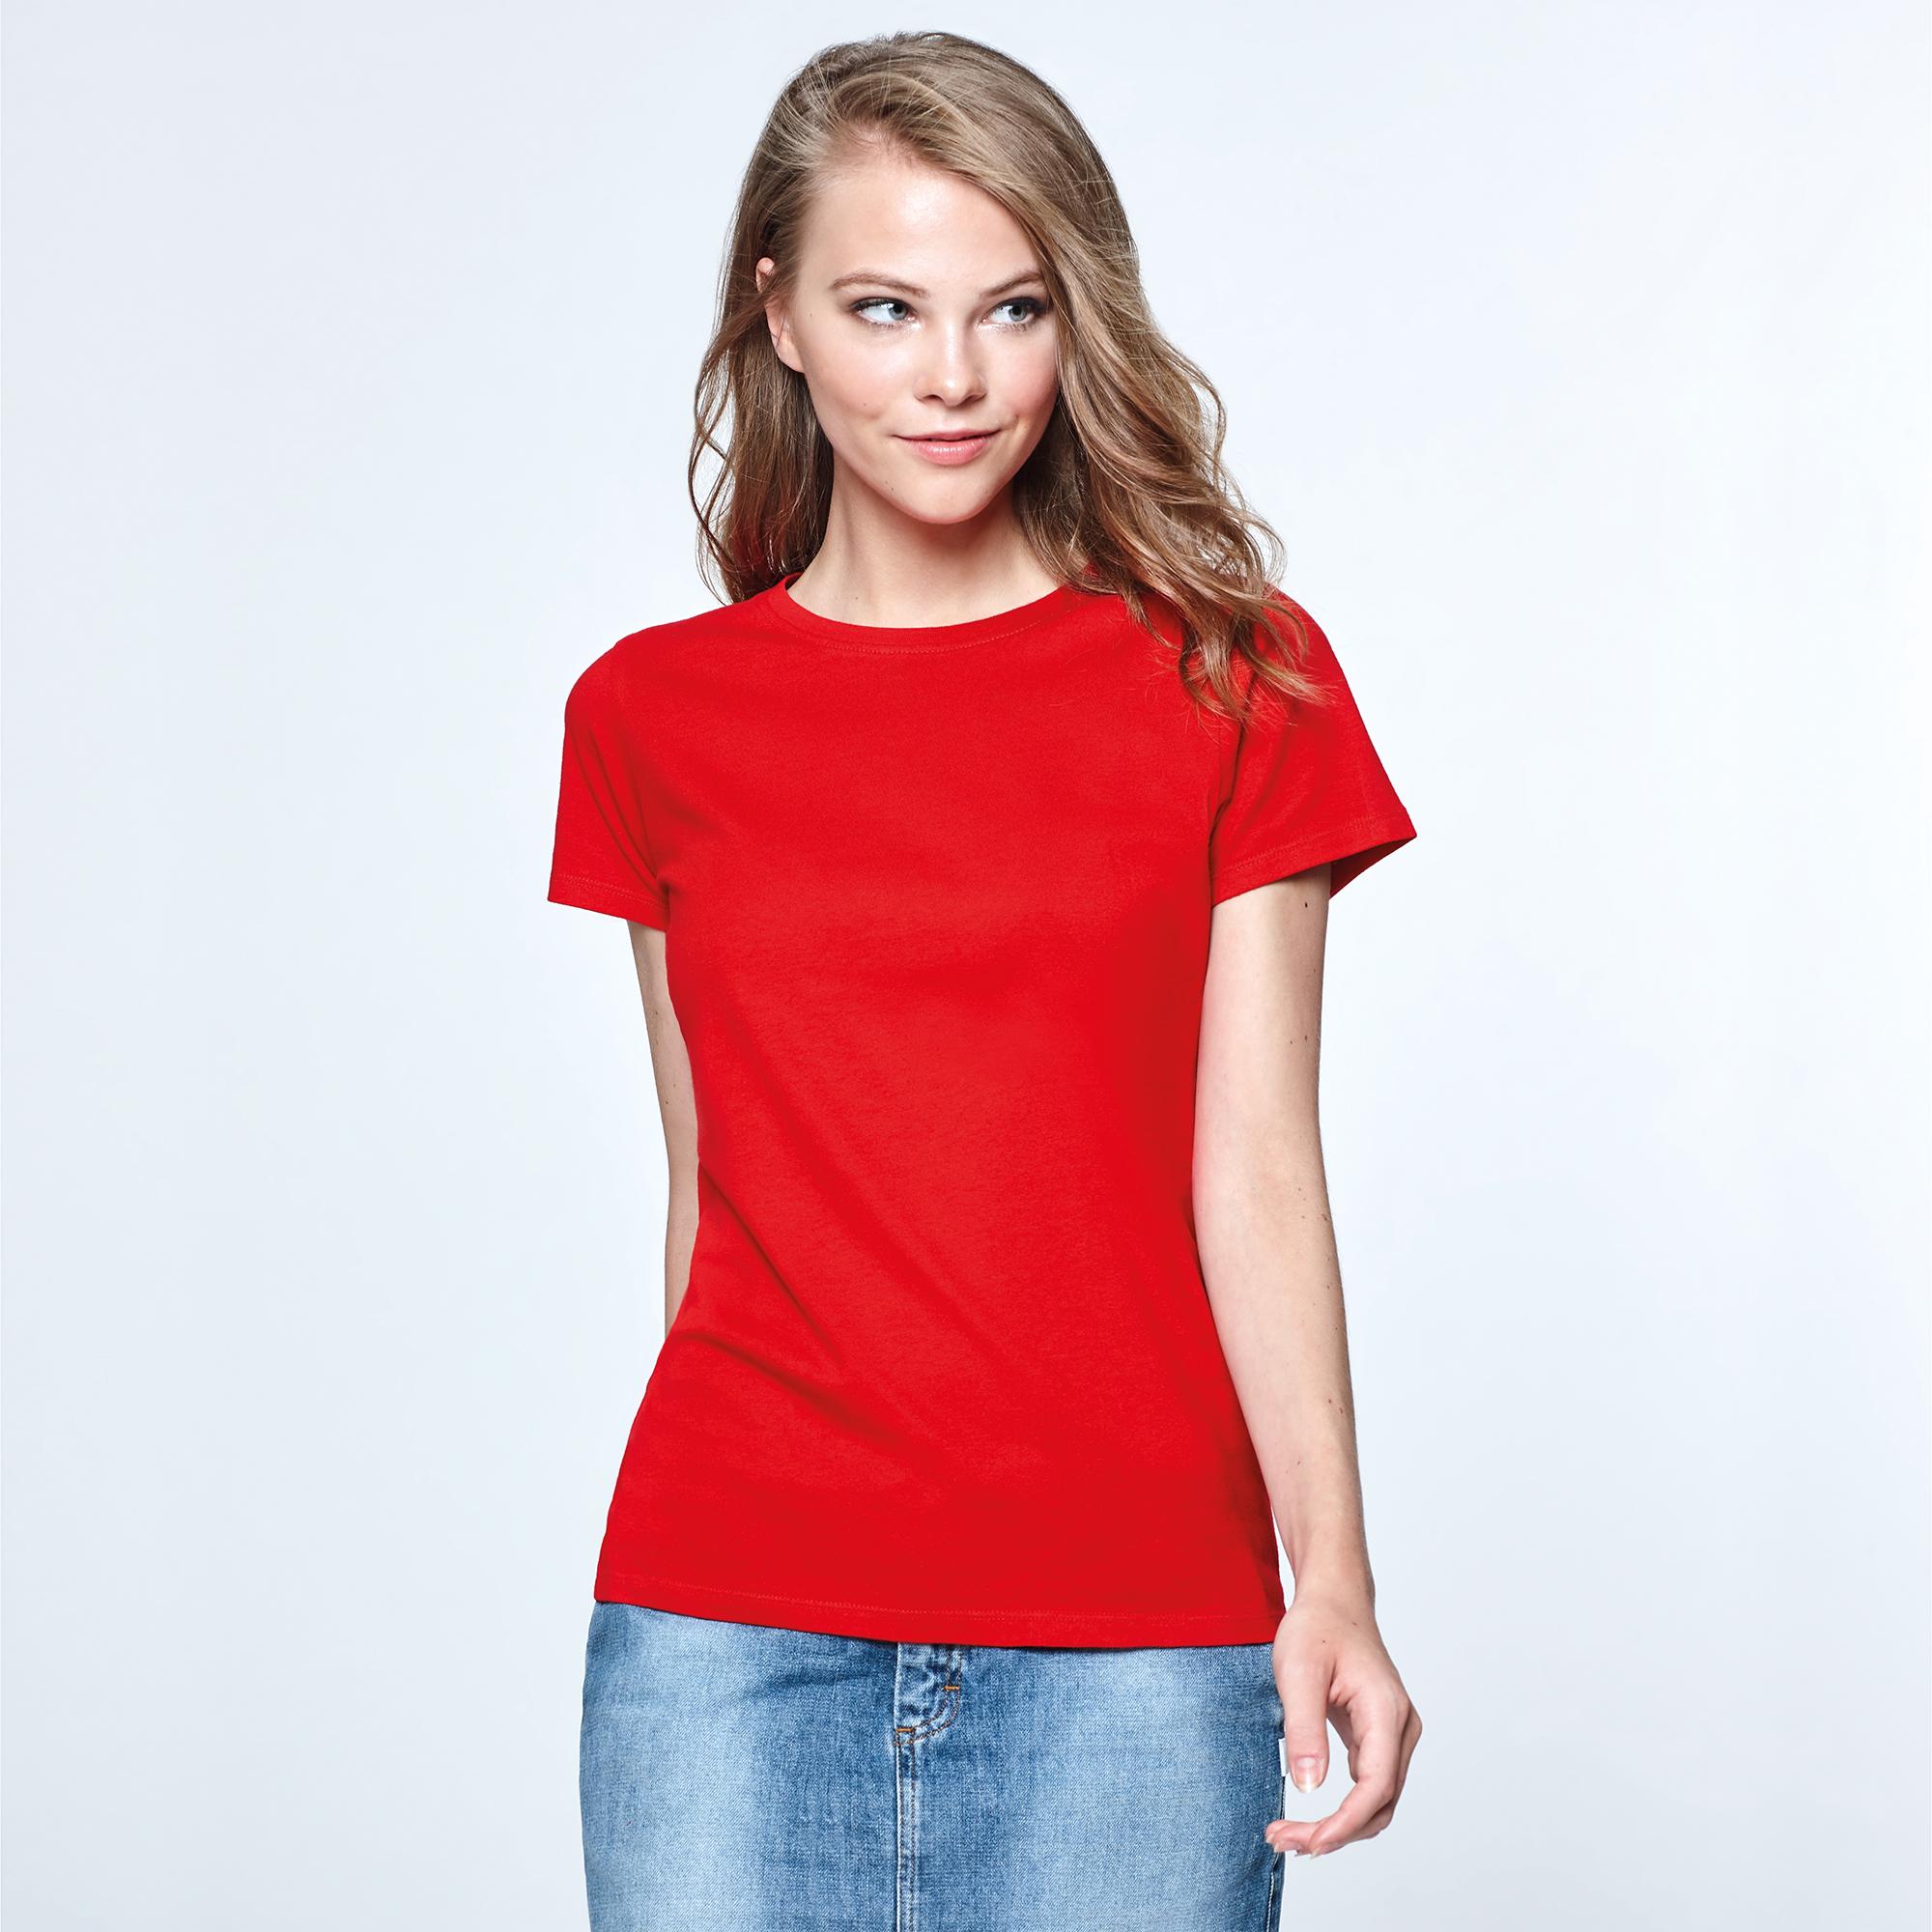 850969aab Camiseta promocional Capri (CA6683)